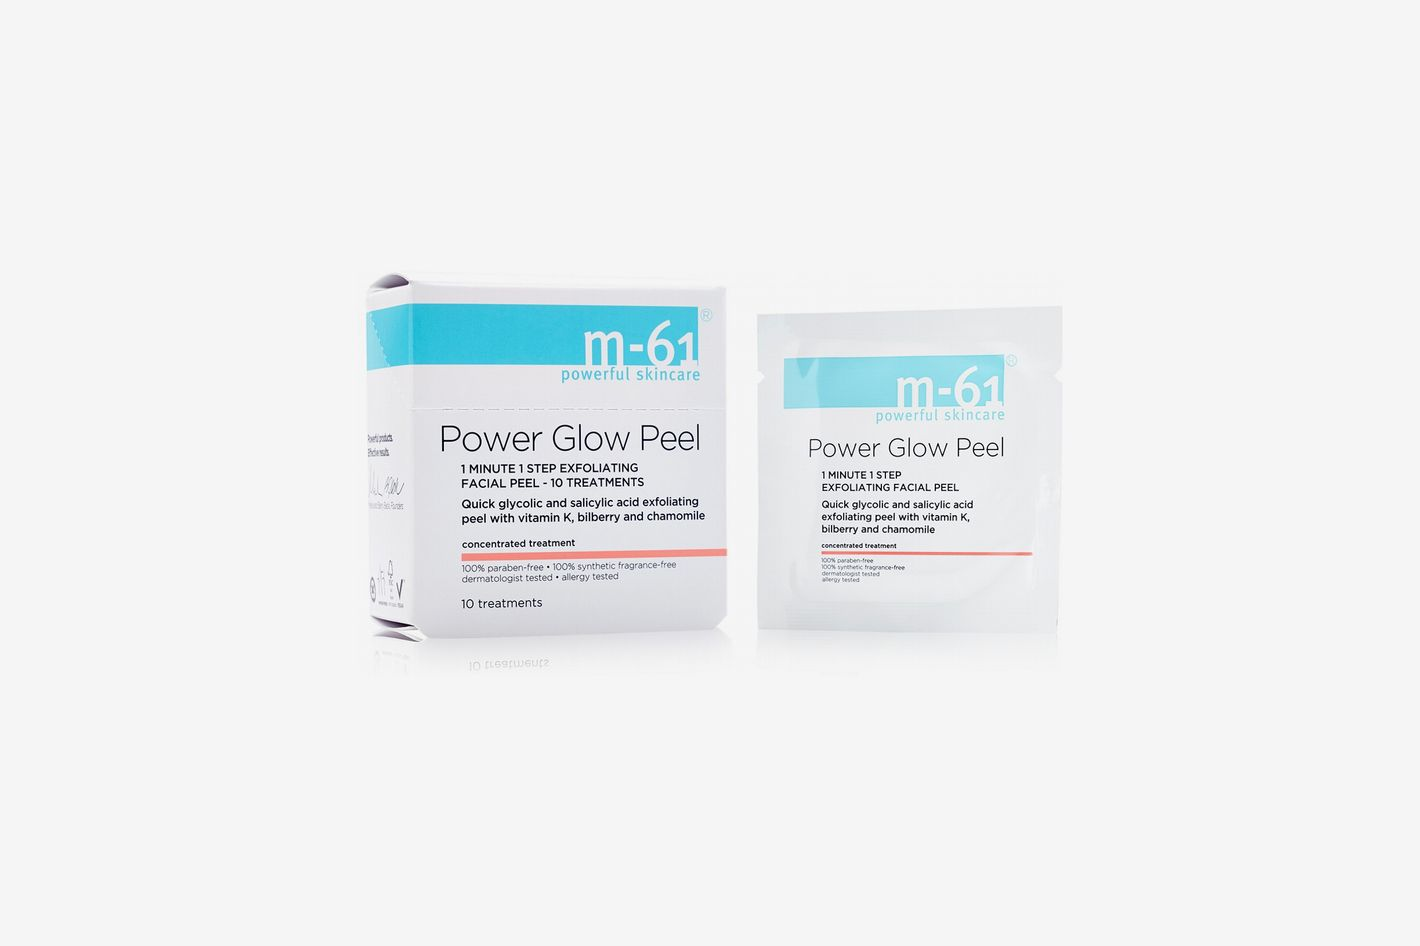 m-61 by Bluemercury PowerGlow Peel 1-Minute 1-Step Exfoliating Facial Peel — 10 Treatments